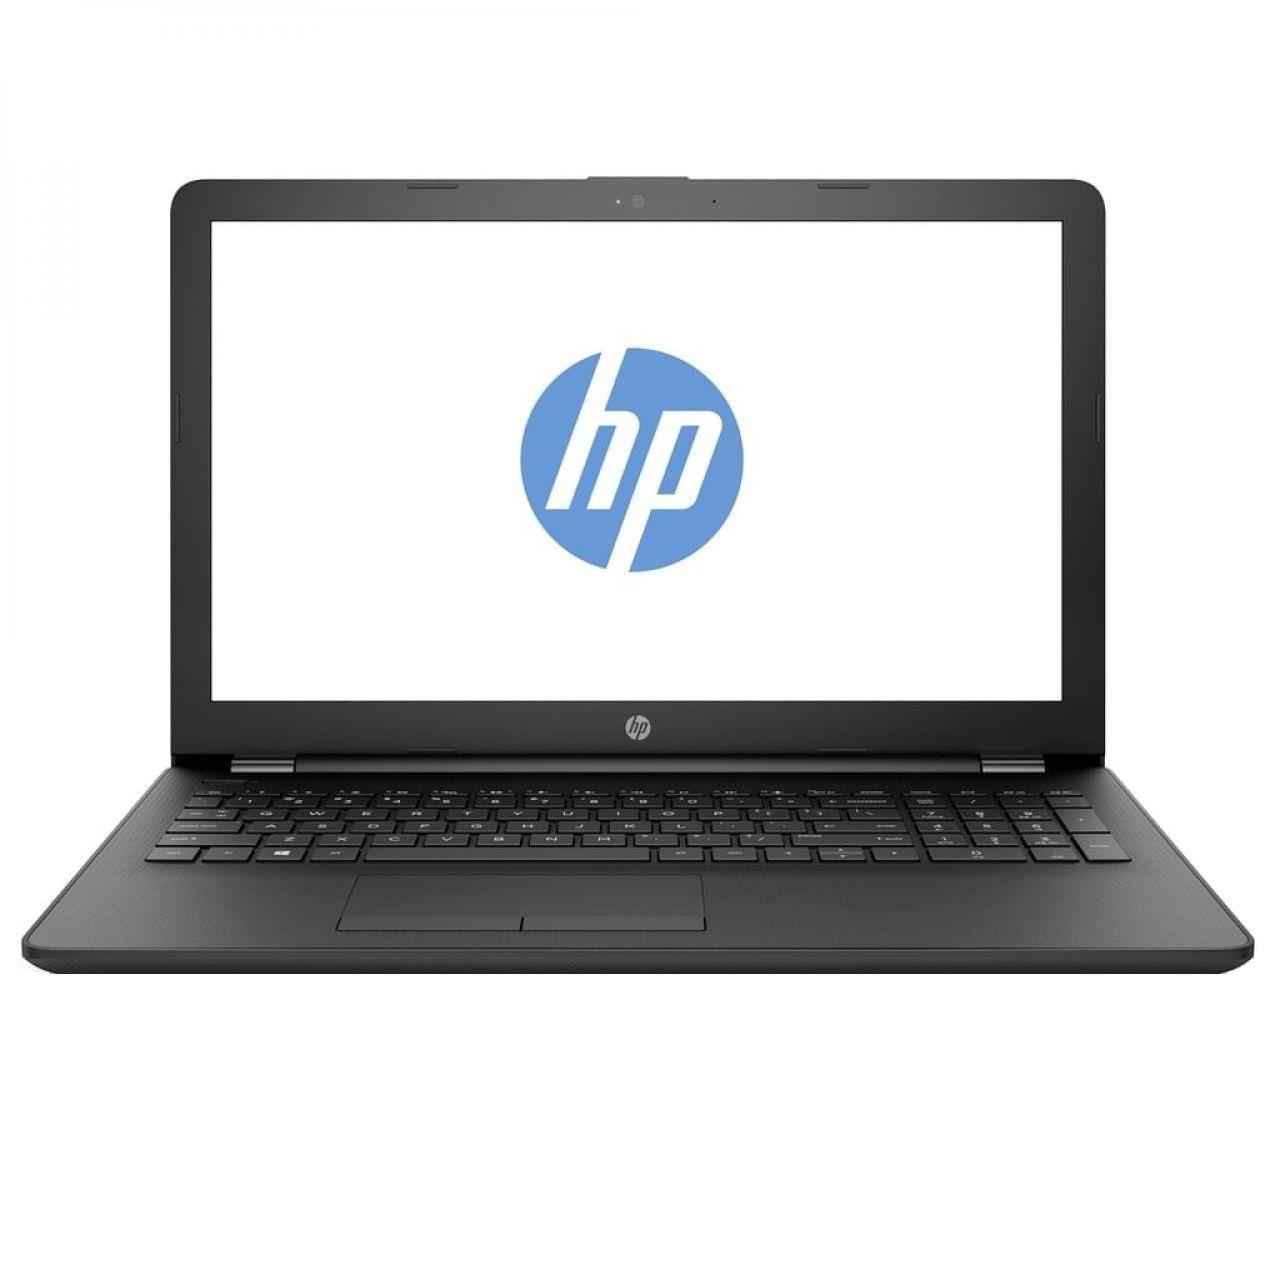 لپ تاپ 15 اینچی اچ پی مدل RA008 - B